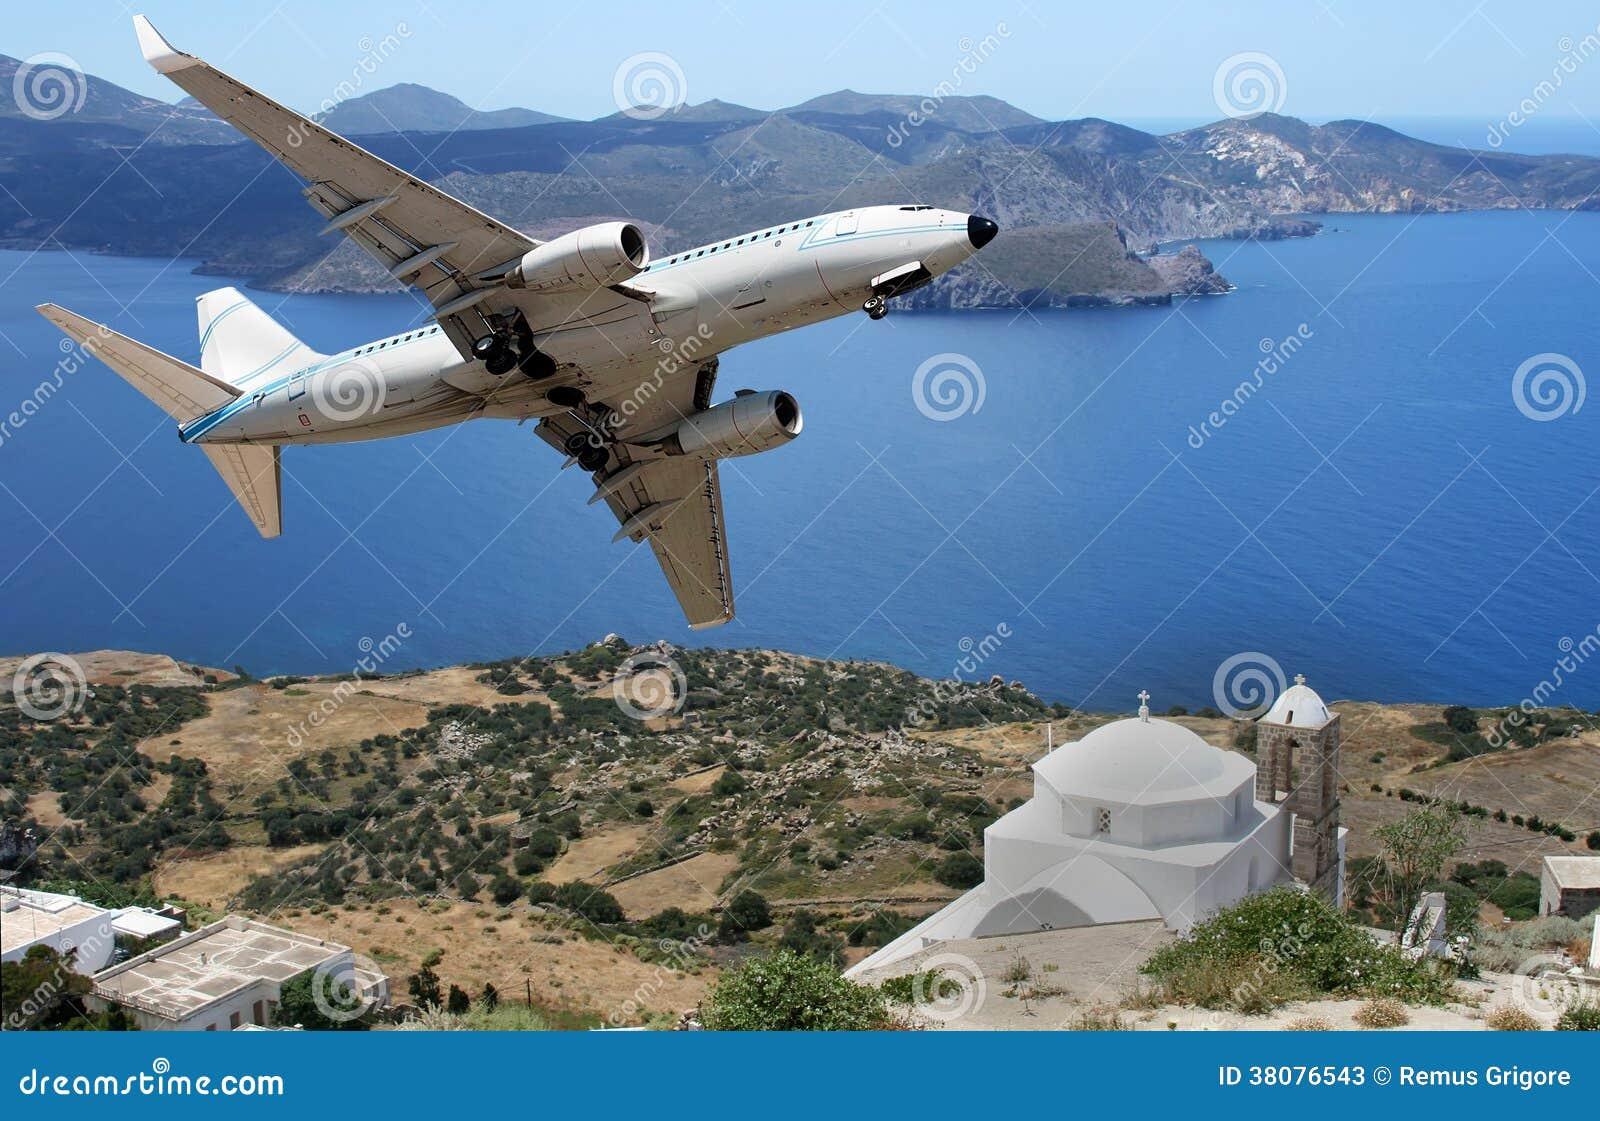 Aeroplano sobre un insland griego